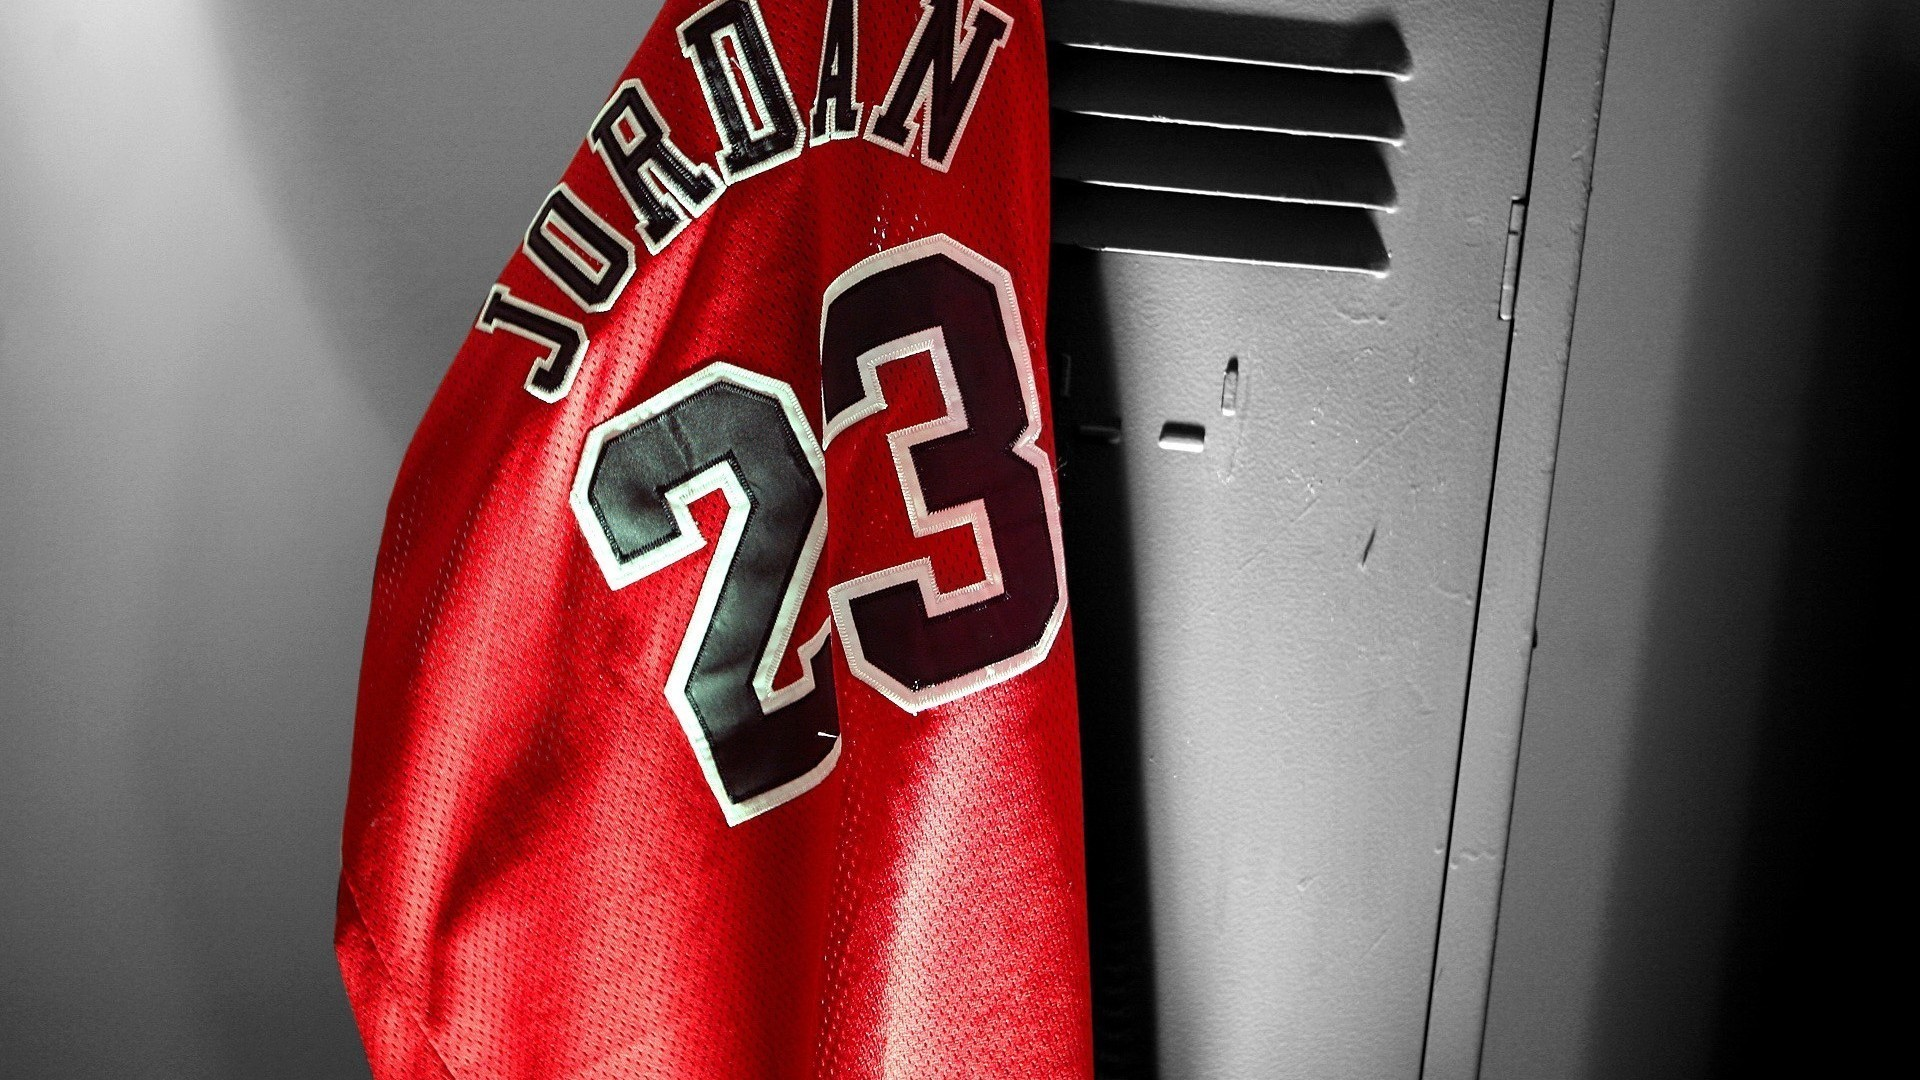 Michael Jordan Dunk Free Wallpapers for Desktop px 526.39 KB